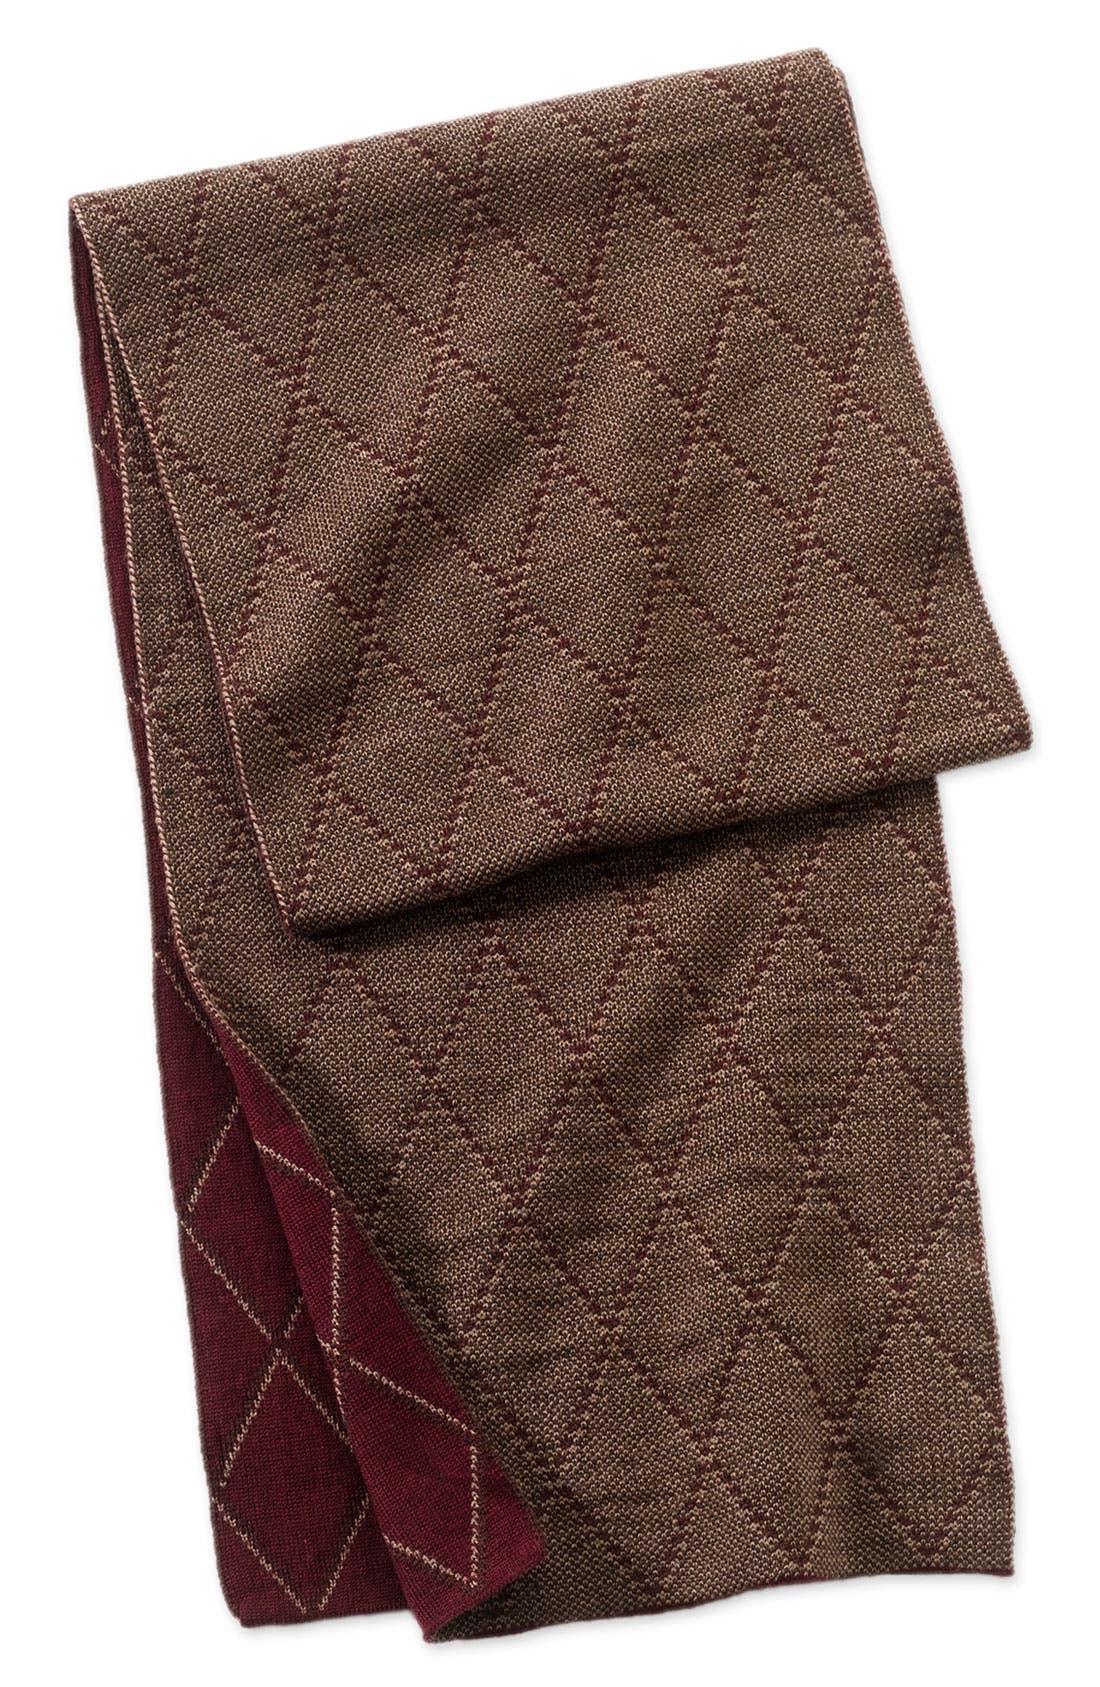 Alternate Image 1 Selected - Nordstrom Patterned Wool Scarf